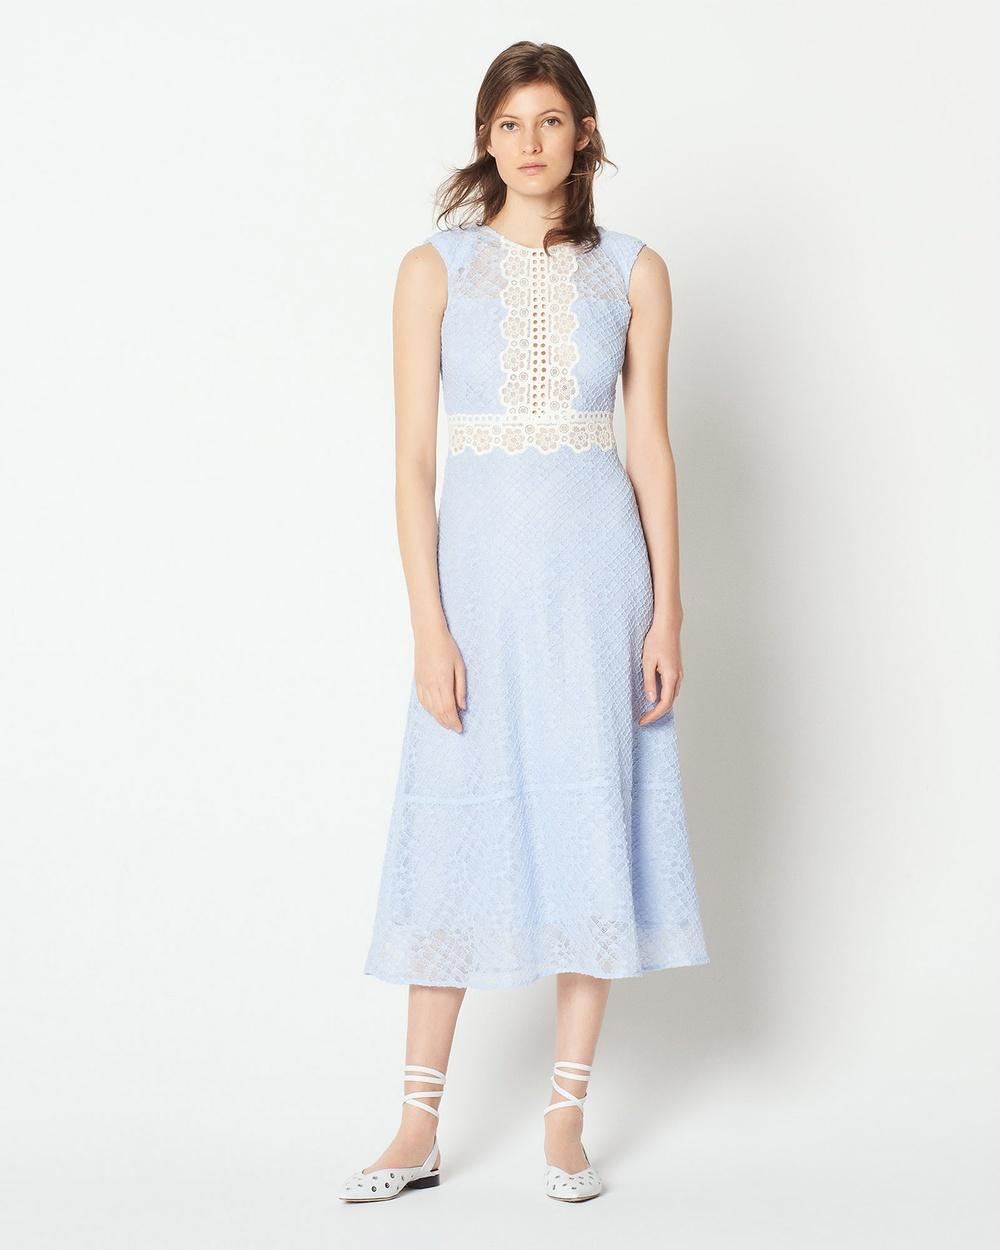 Sandro Hot Dress Dresses Sky Blue Hot Dress